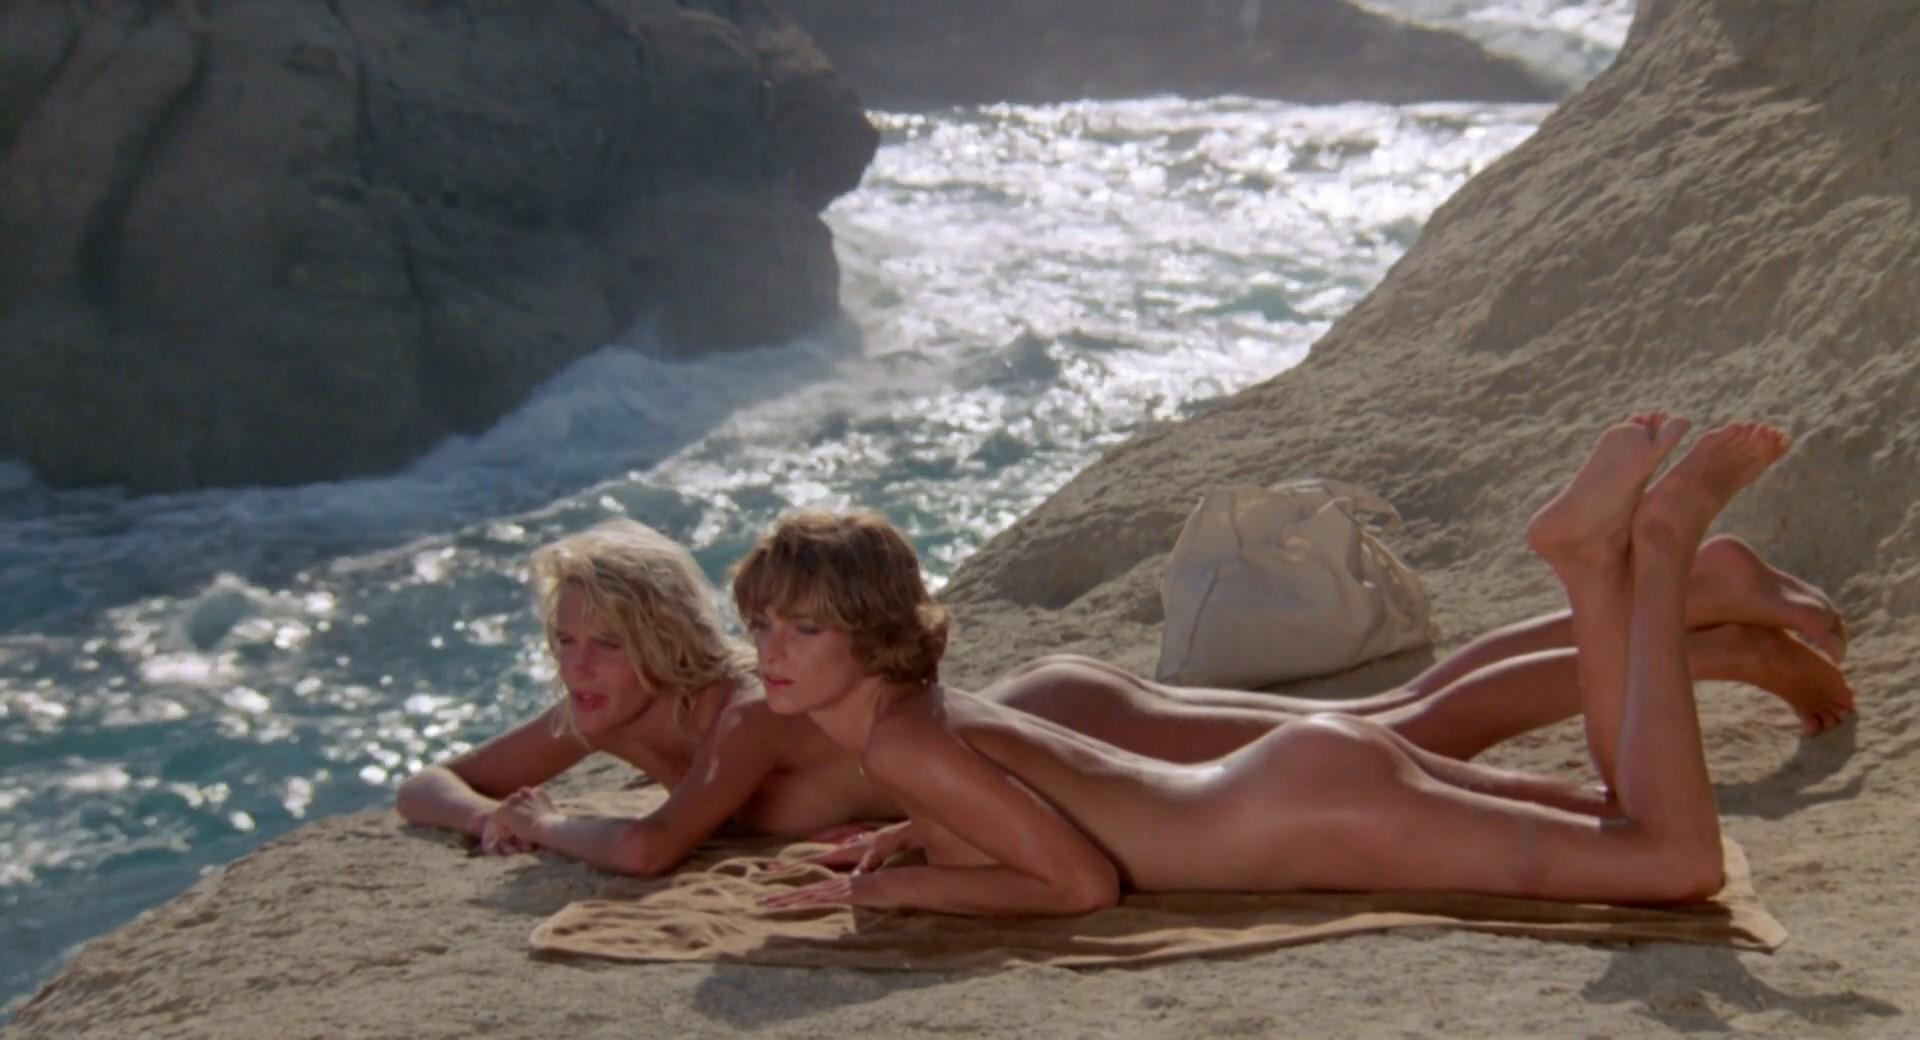 Latina gangster girls nude